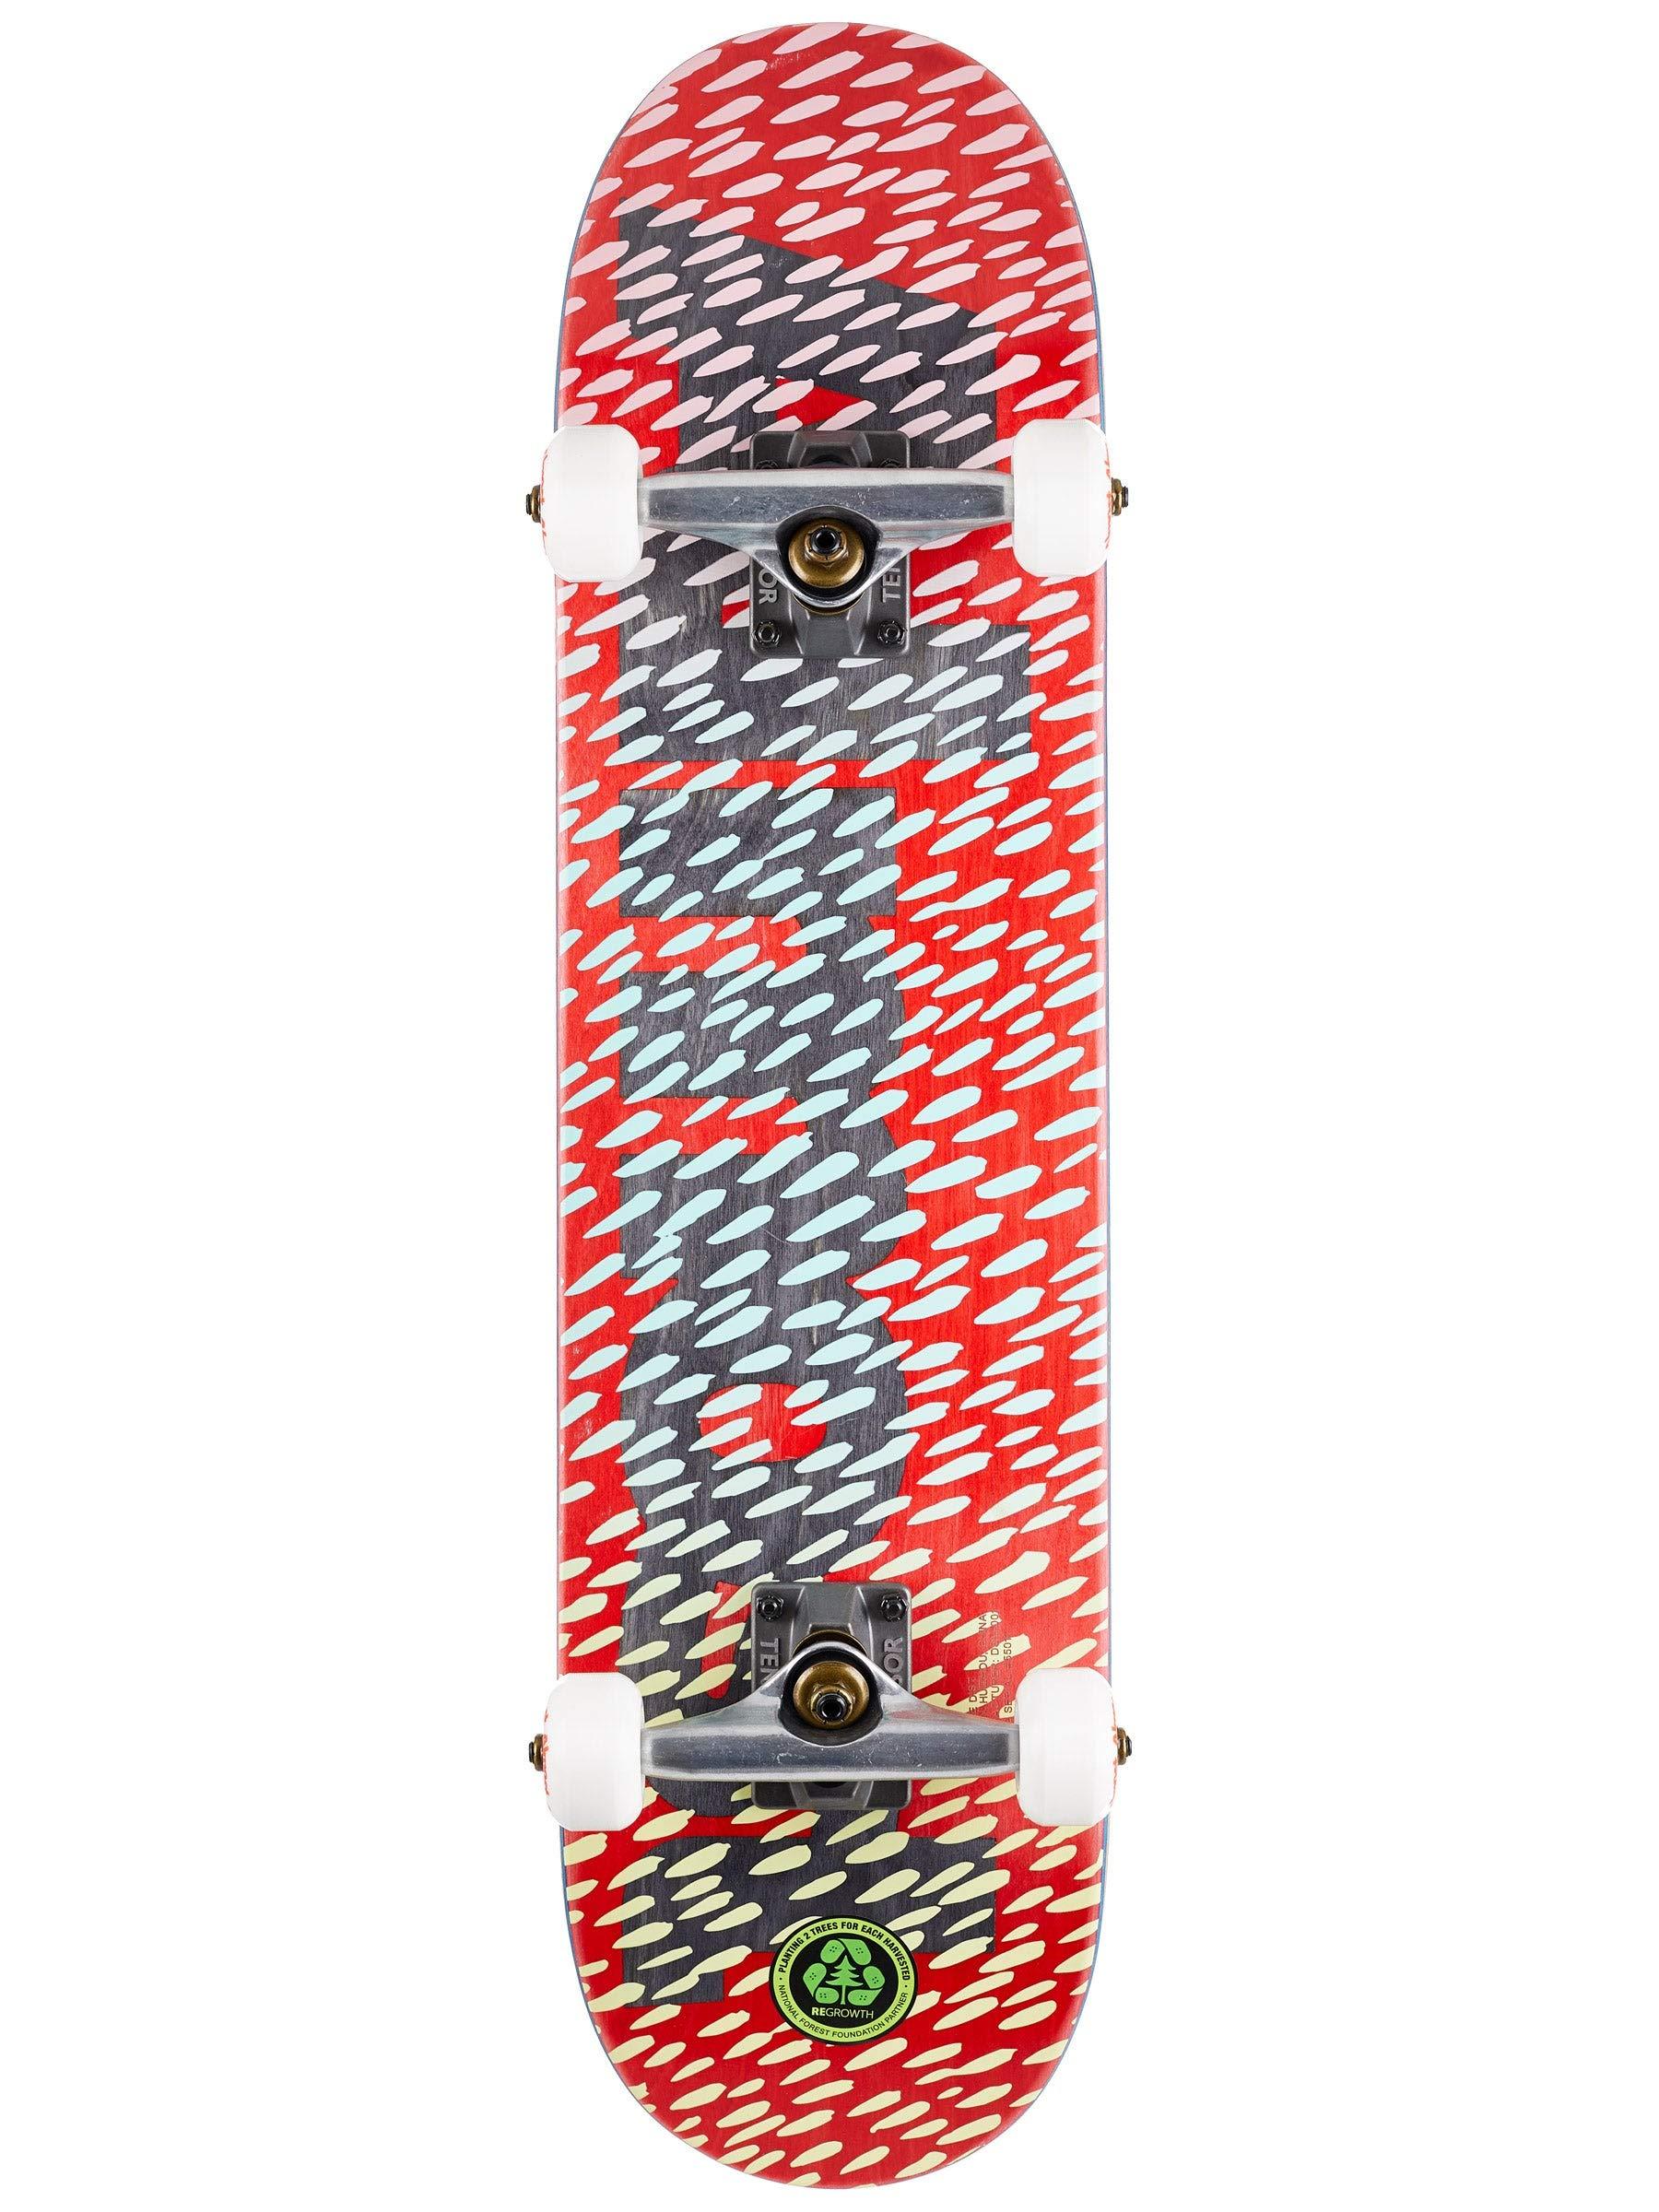 3 Wheel 110MM Wheels Adult Single-row Skates Full Flash Roller Skates XZ15 Inline Skates Color : #1, Size : EU 35//US 4//UK 3//JP 22.5cm